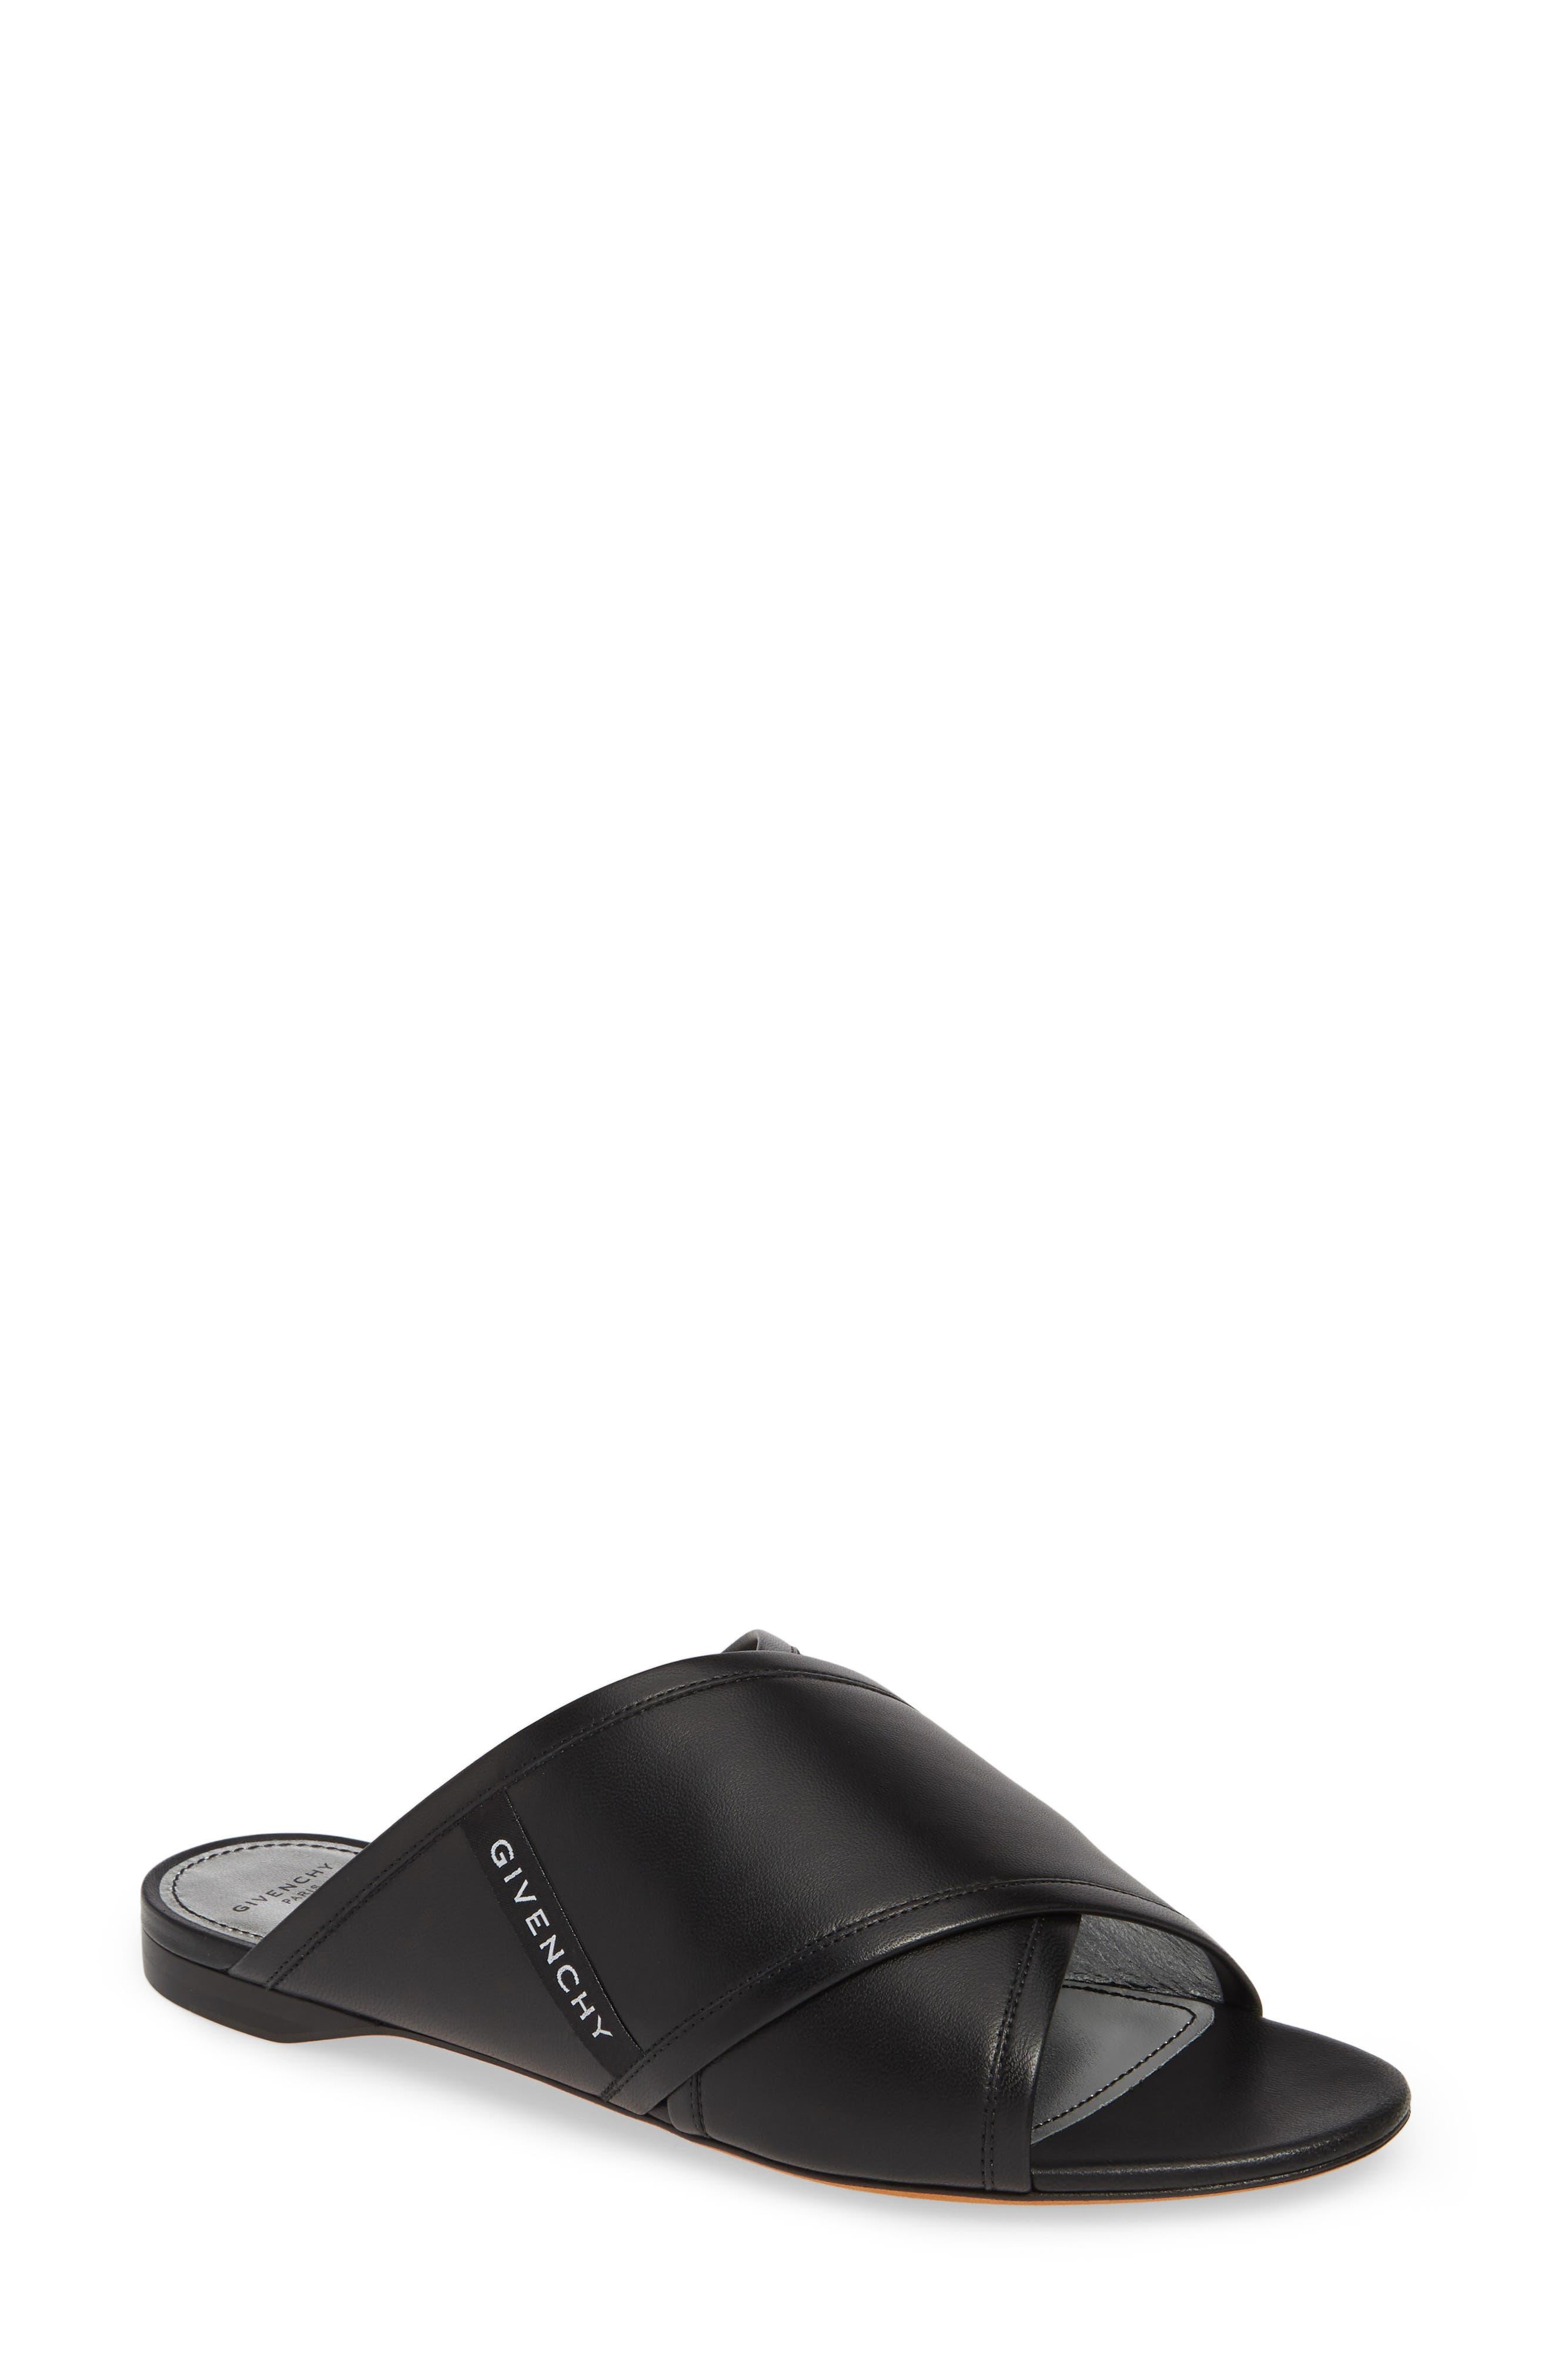 Rivington Crisscross Sandal, Main, color, BLACK